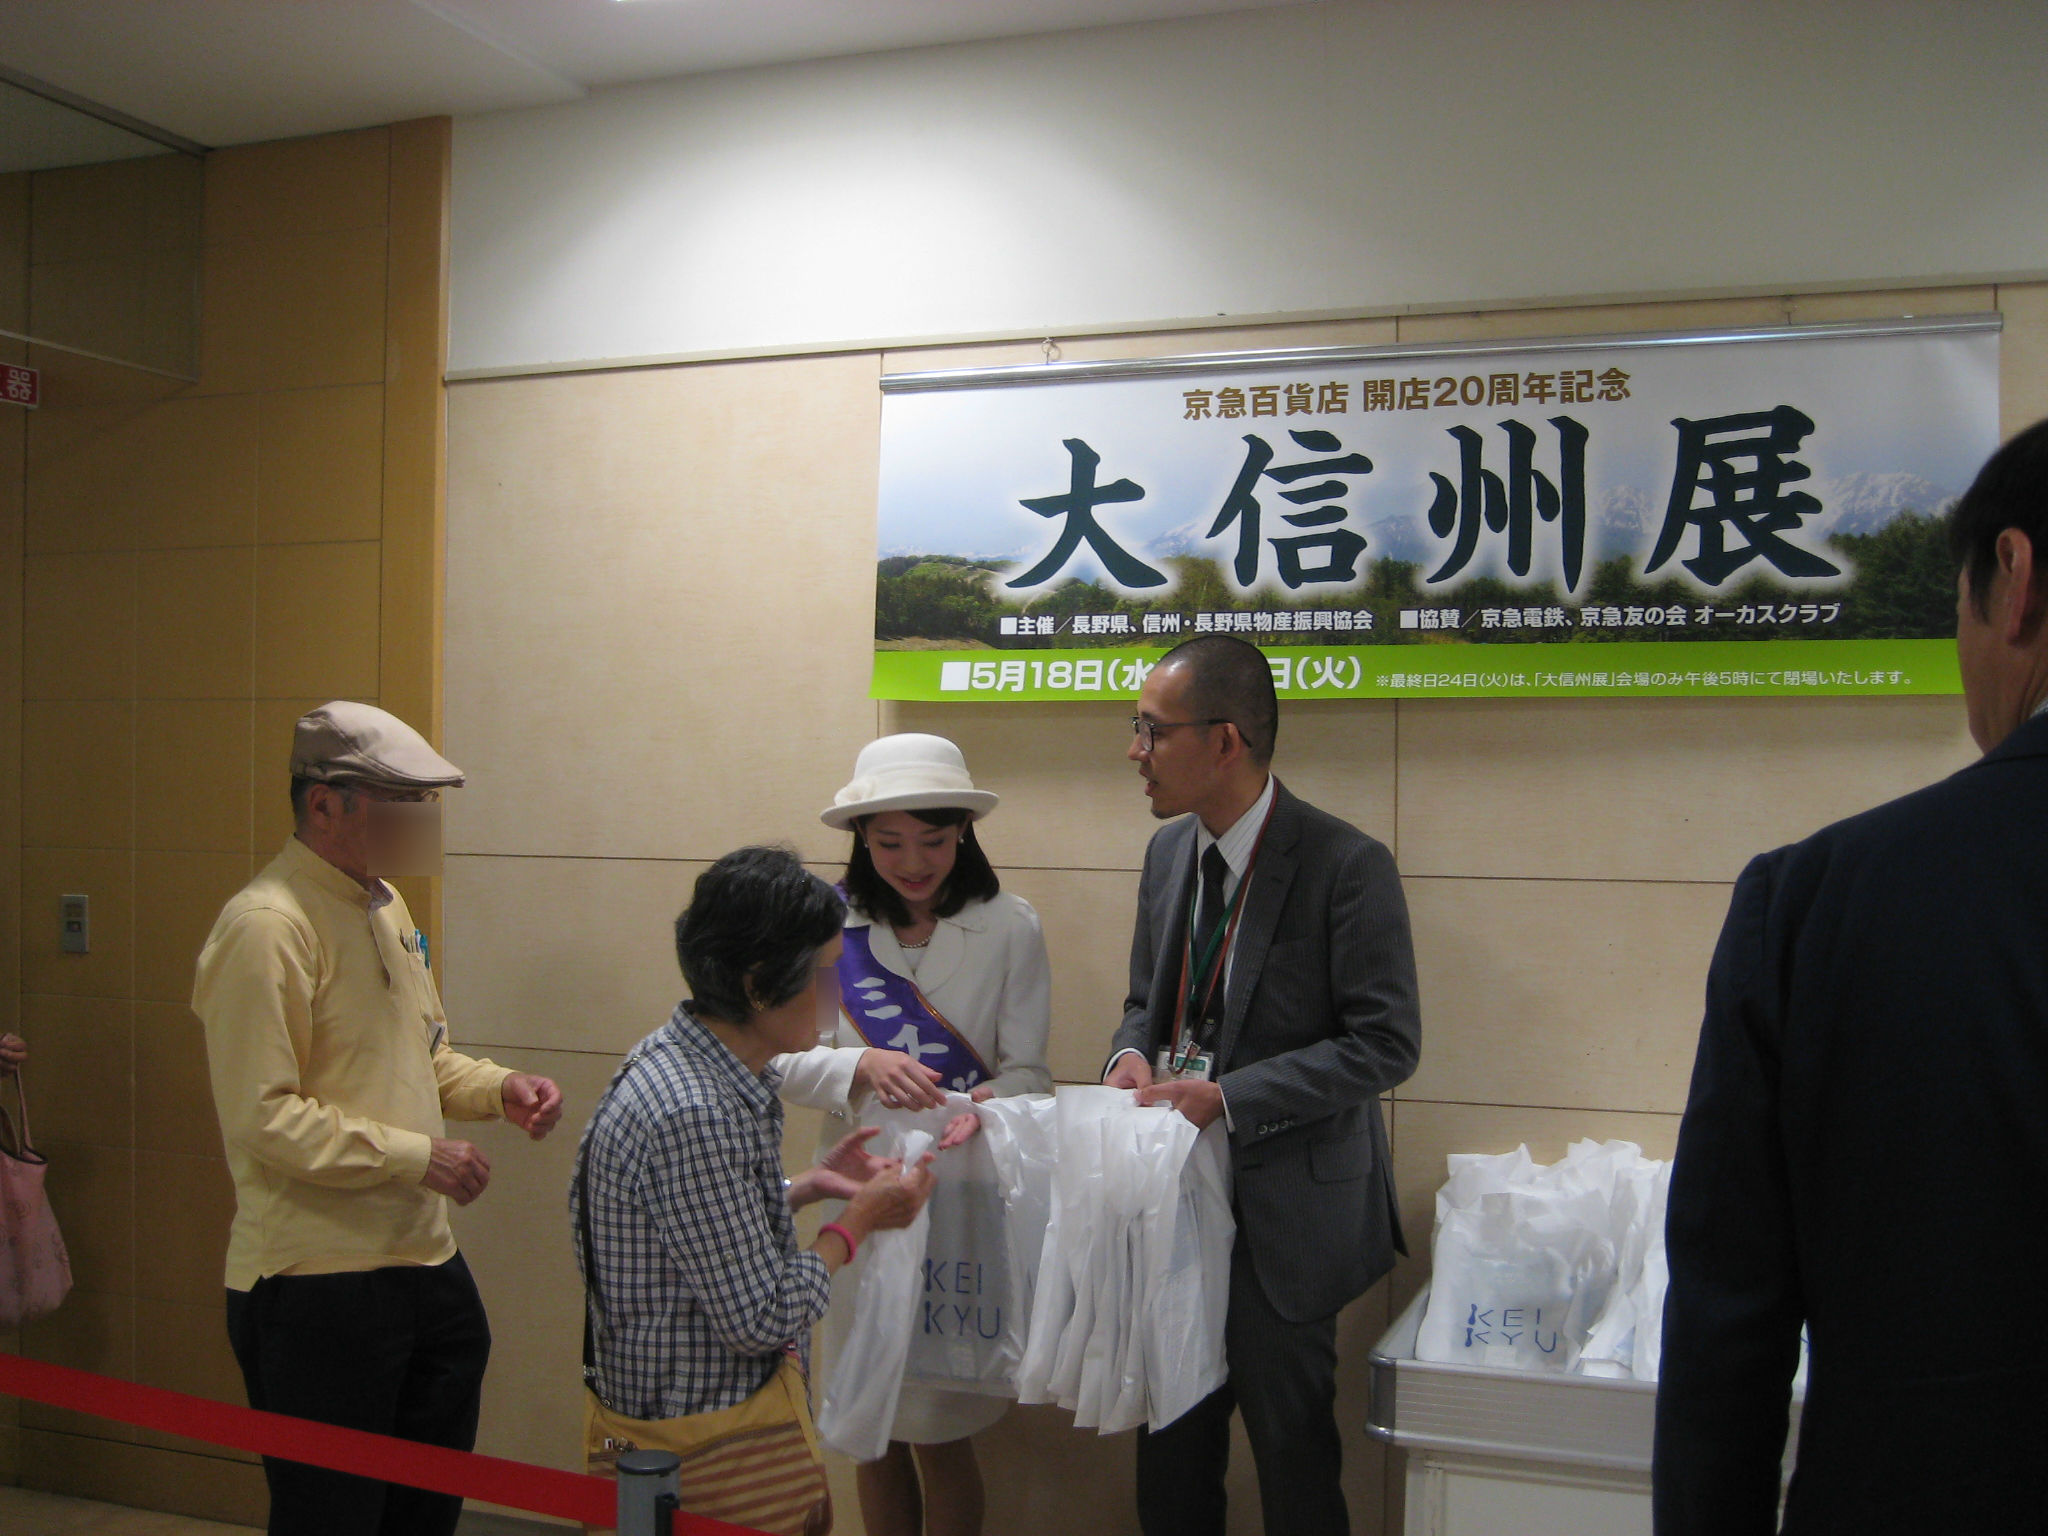 H28大信州展:京急百貨店